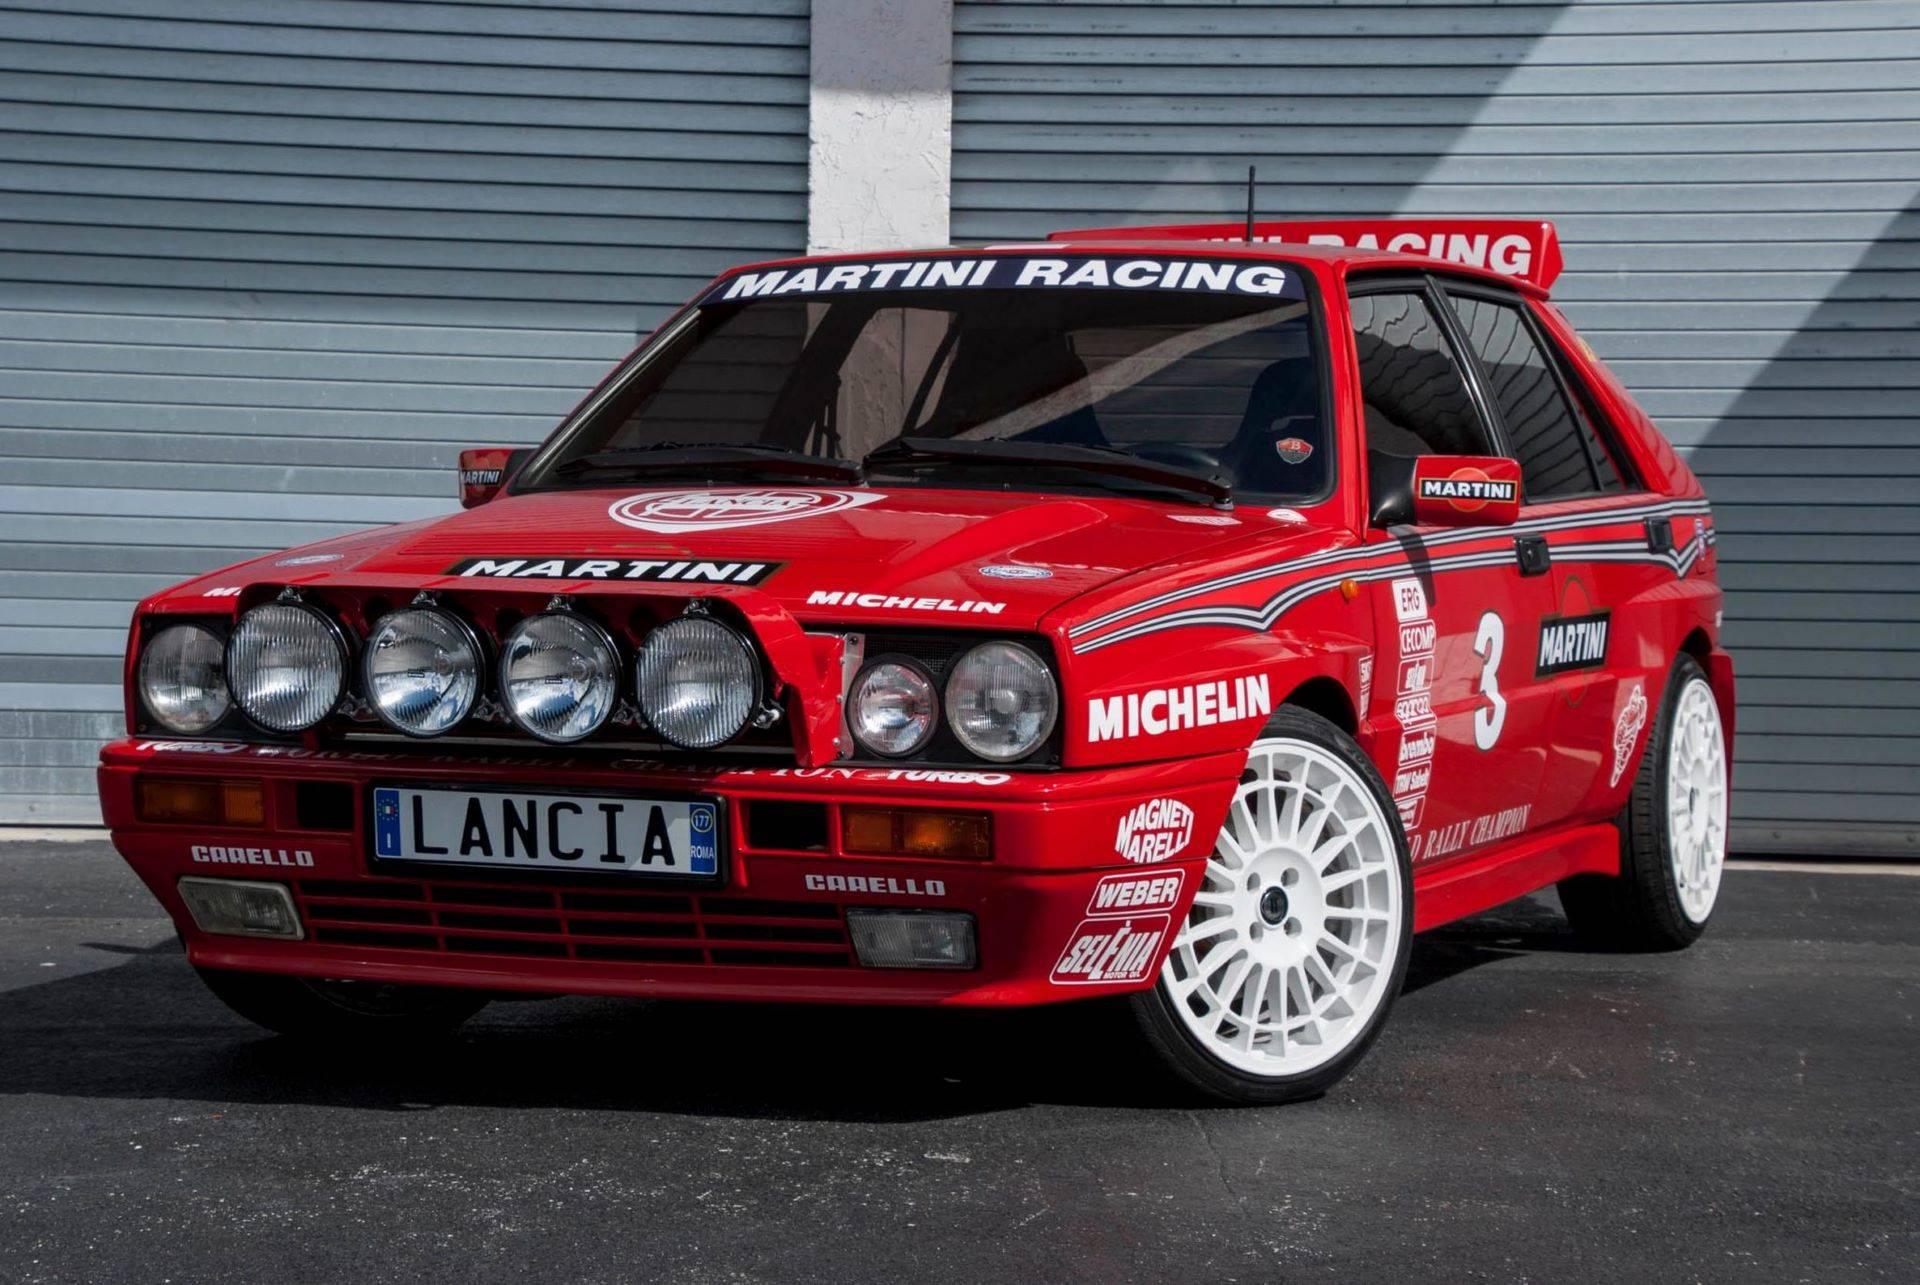 Lancia-Delta-Integrale-8V-1989-1